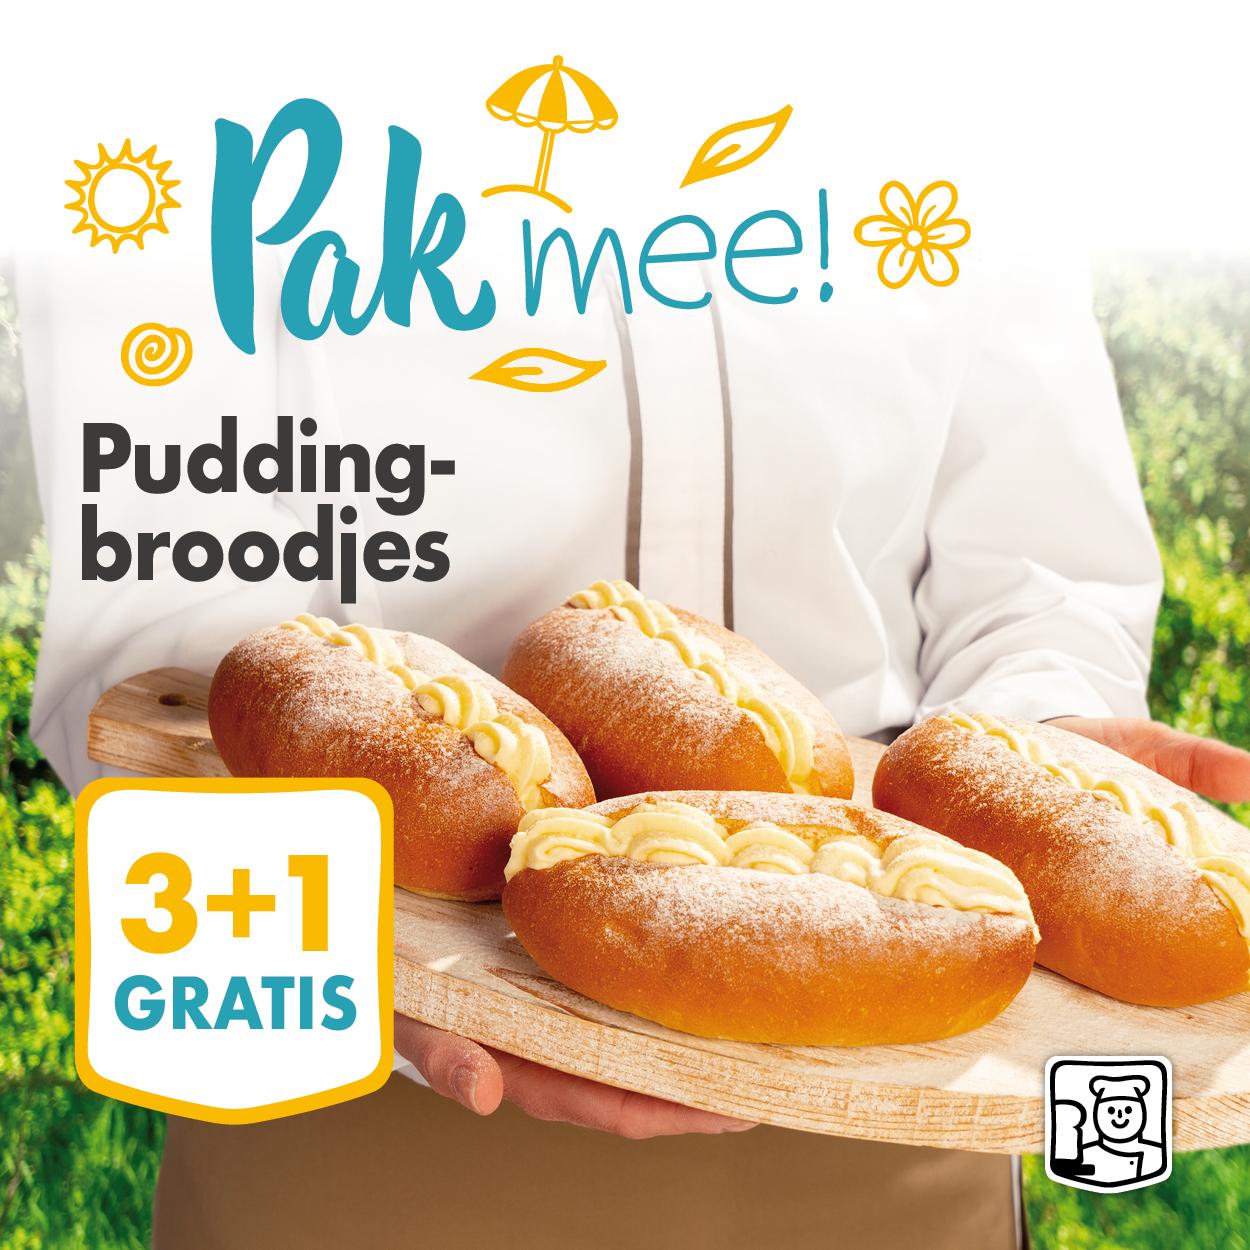 Puddingbroodjes vier halen drie betalen